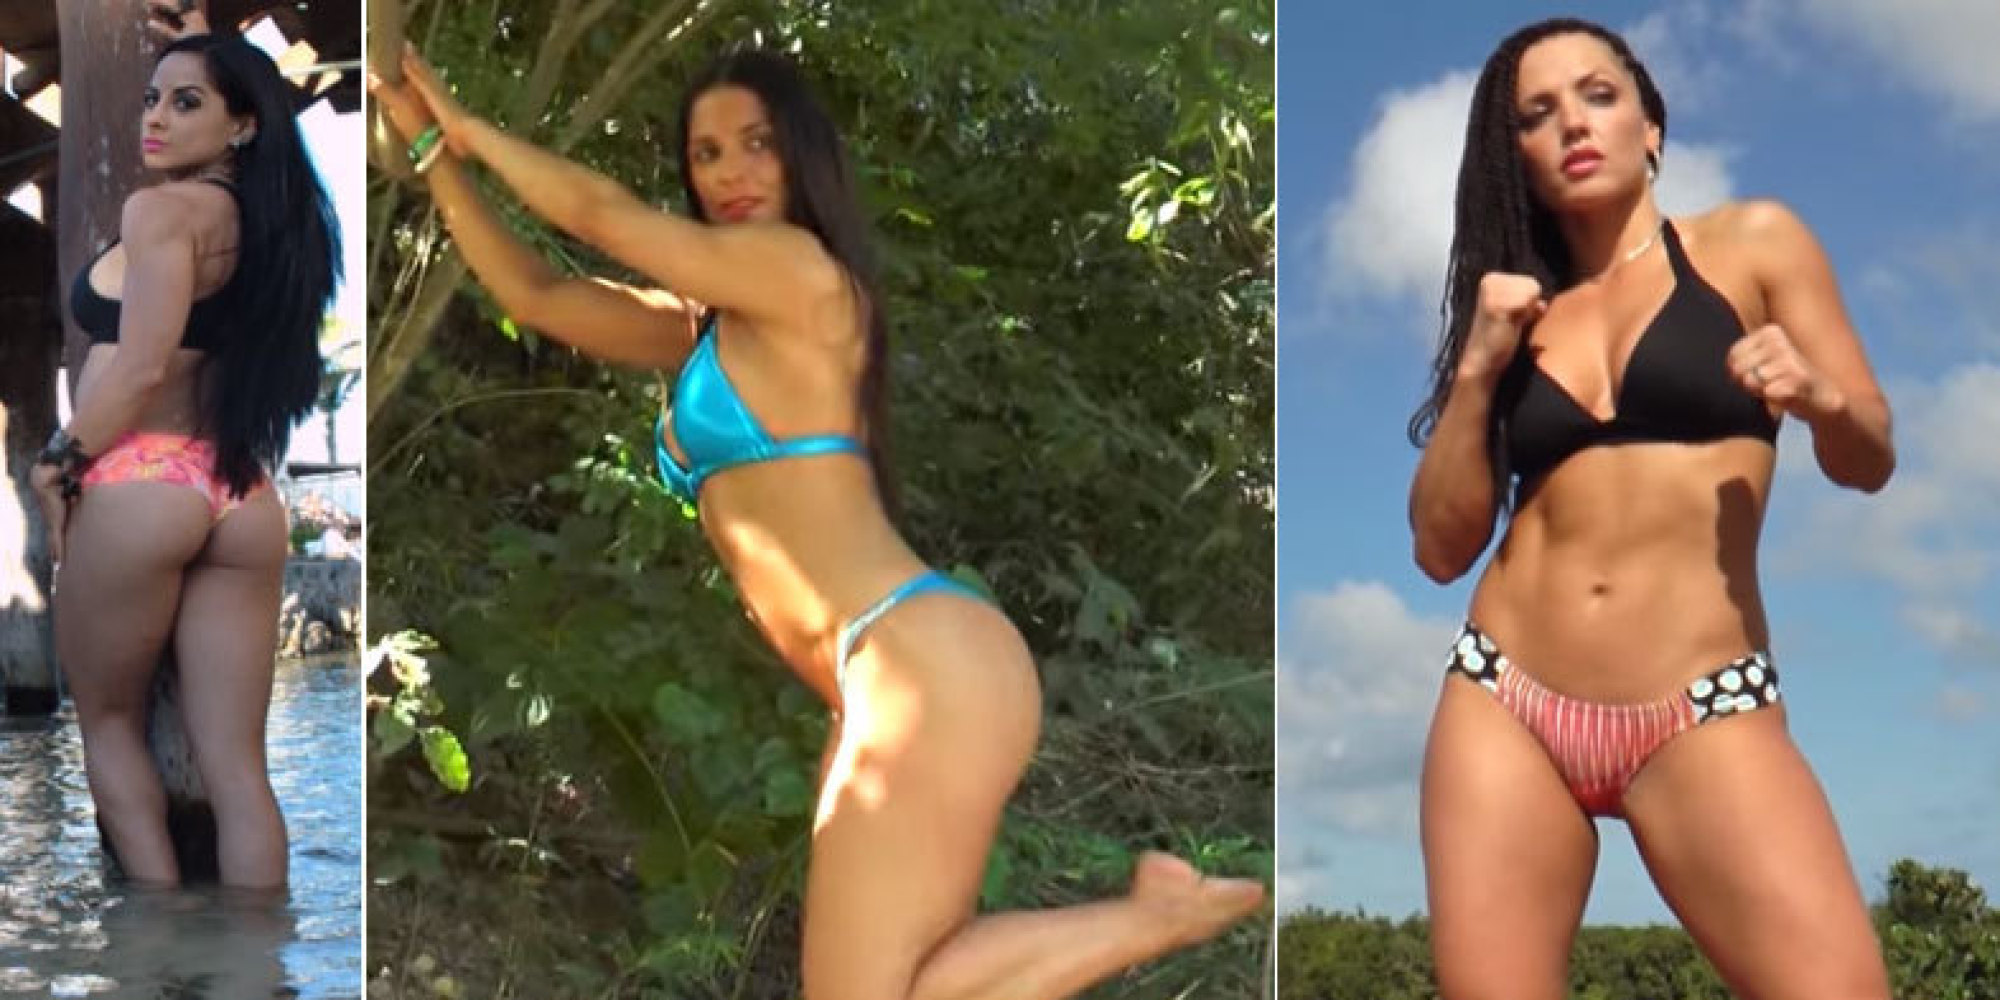 fotos de prostitutas desnudas zonas de prostitutas en cordoba